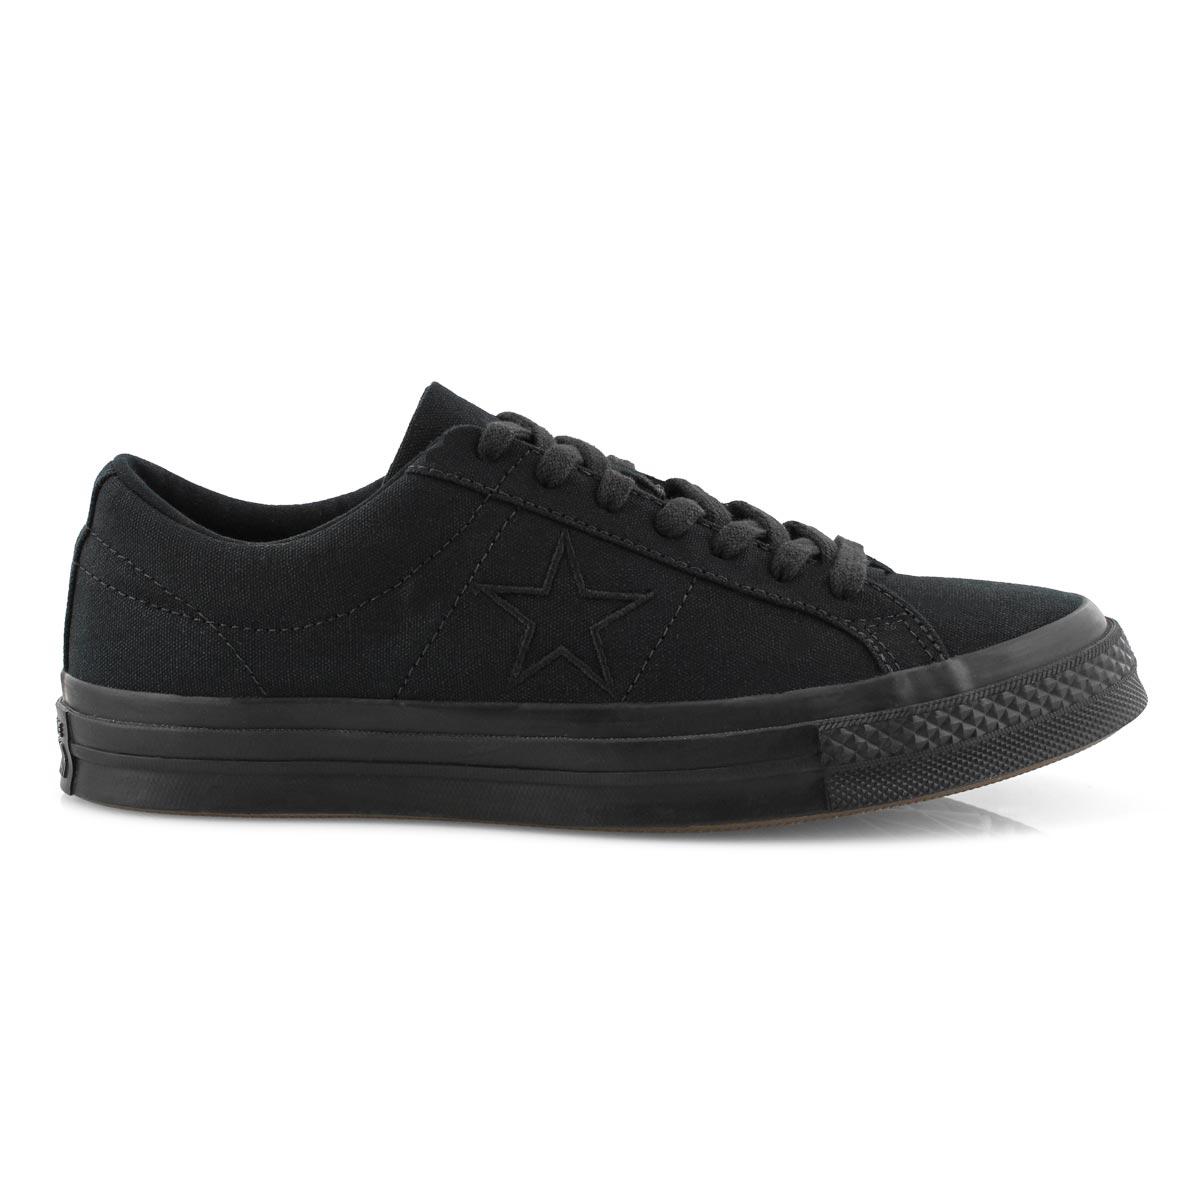 Men's One Star Sneaker - Black/Black